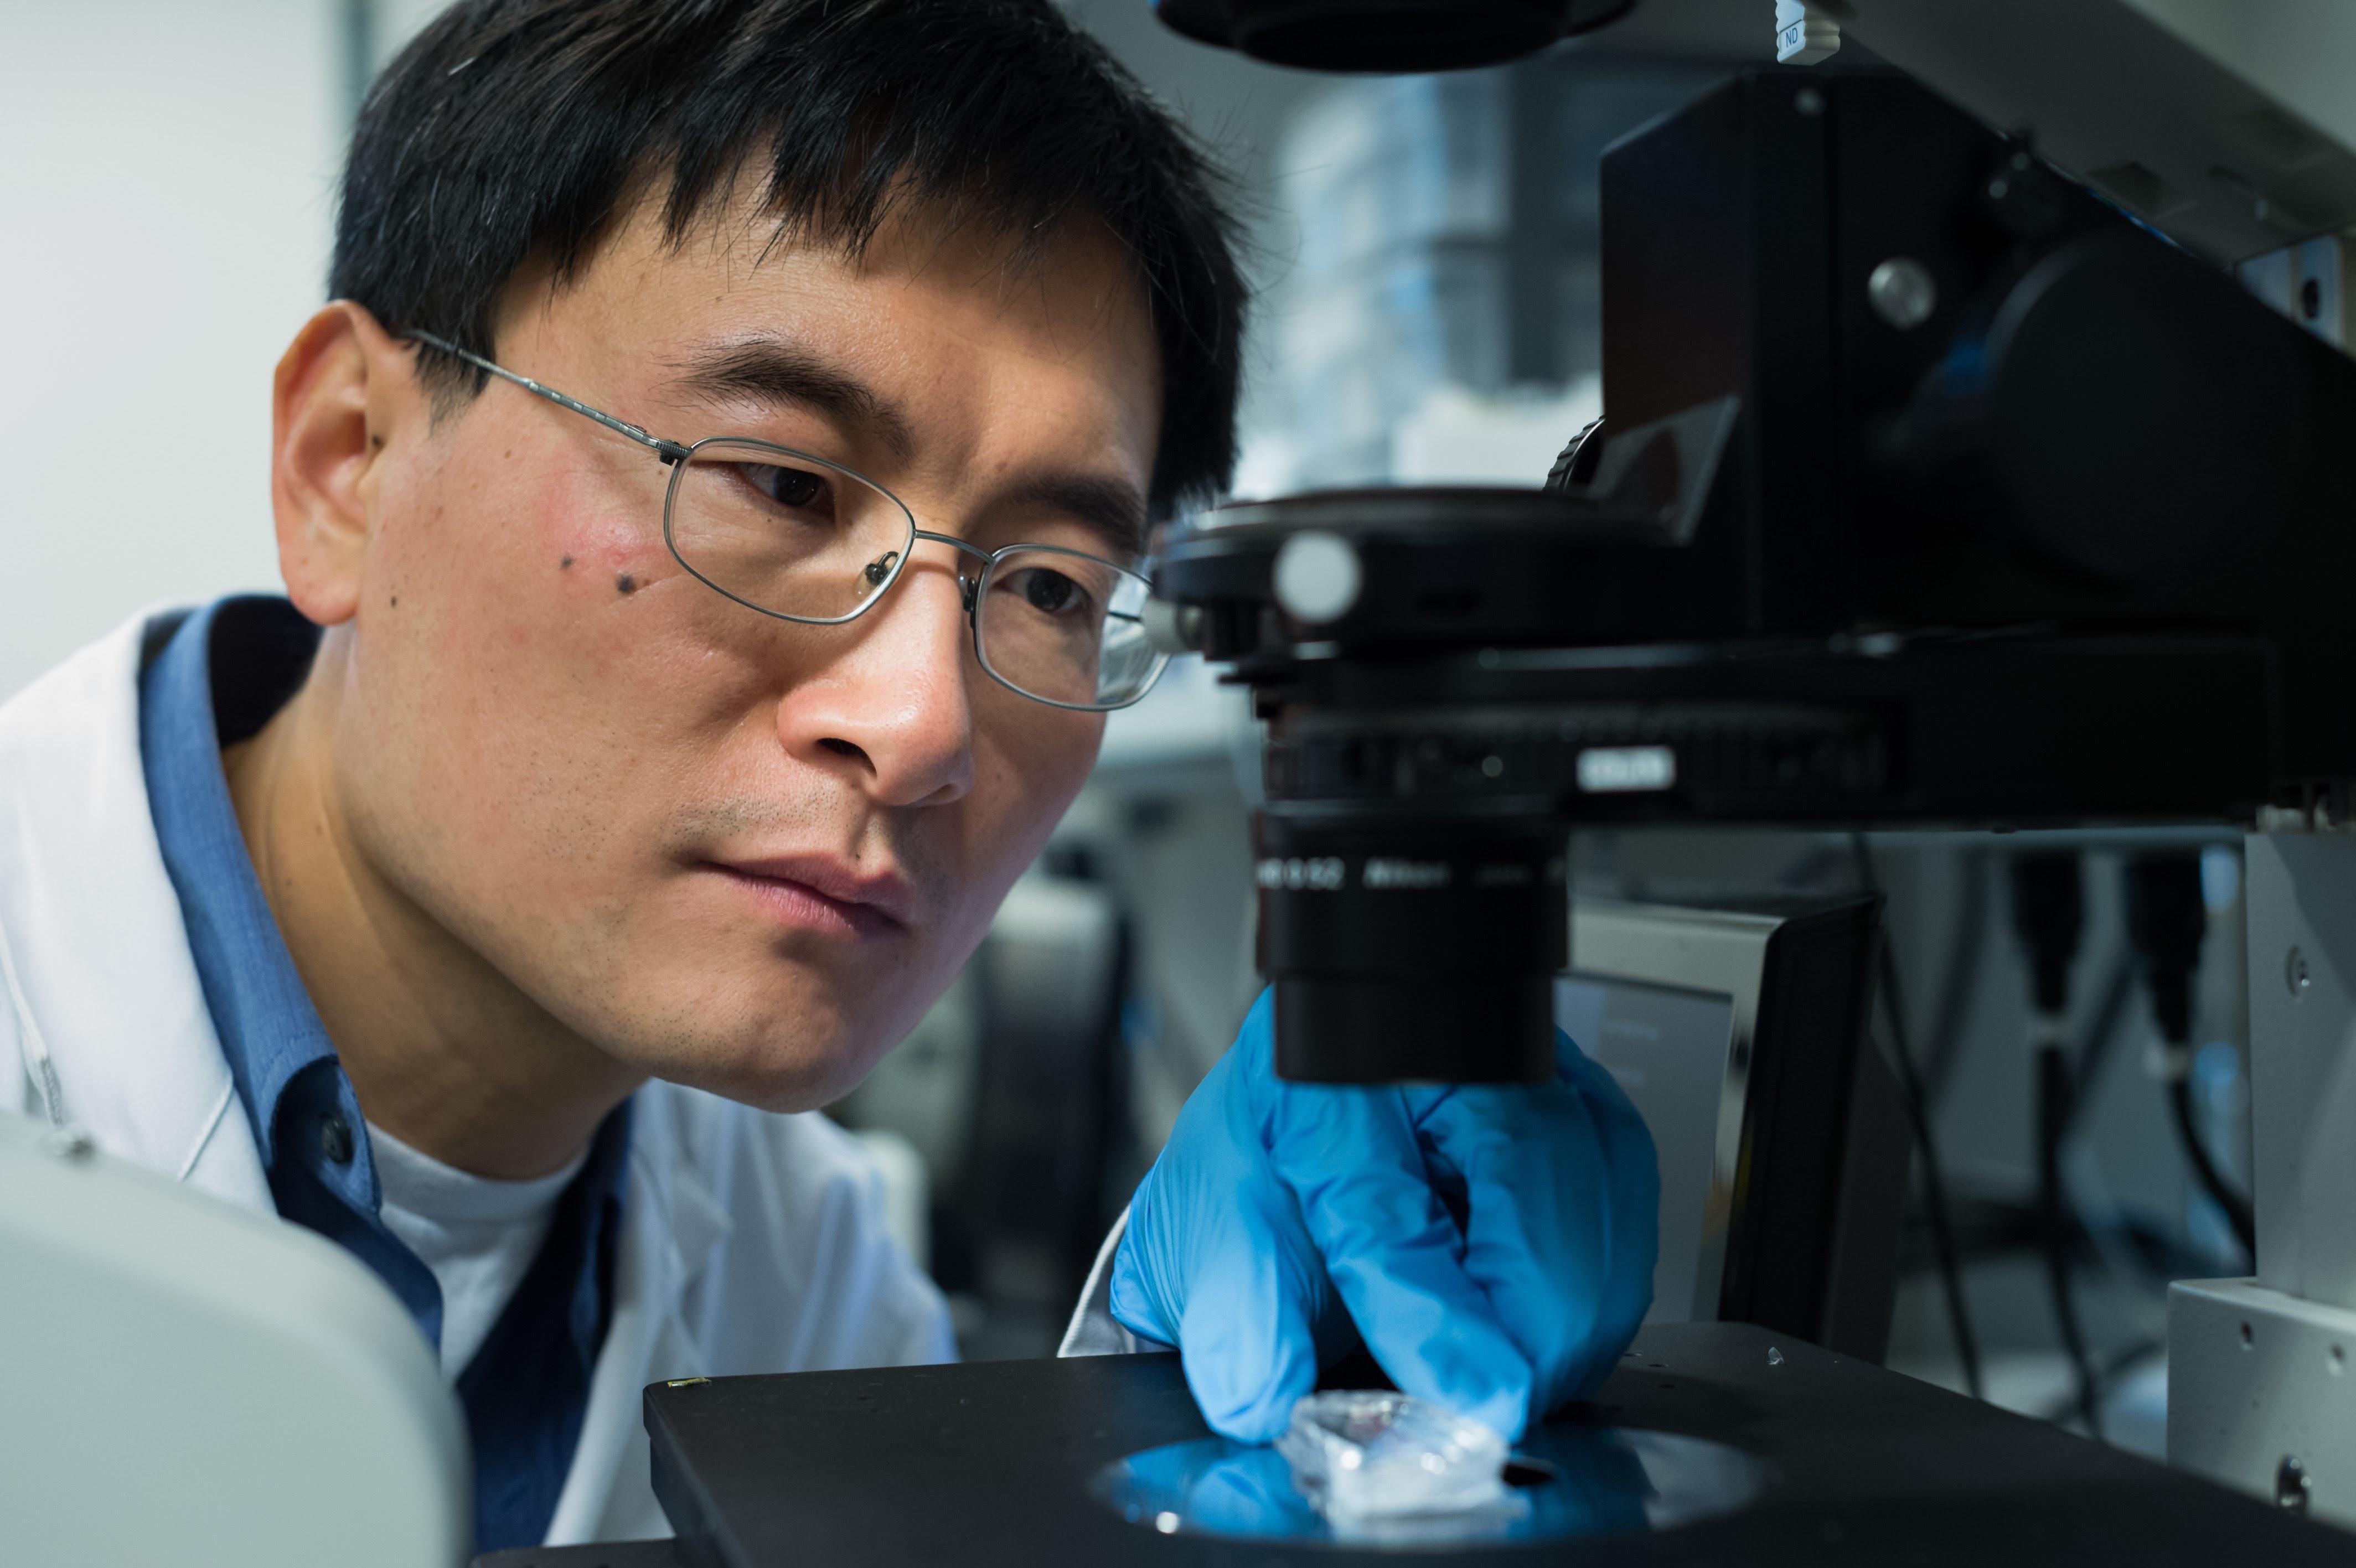 Dr. Hongshen Ma inspects a microscope.